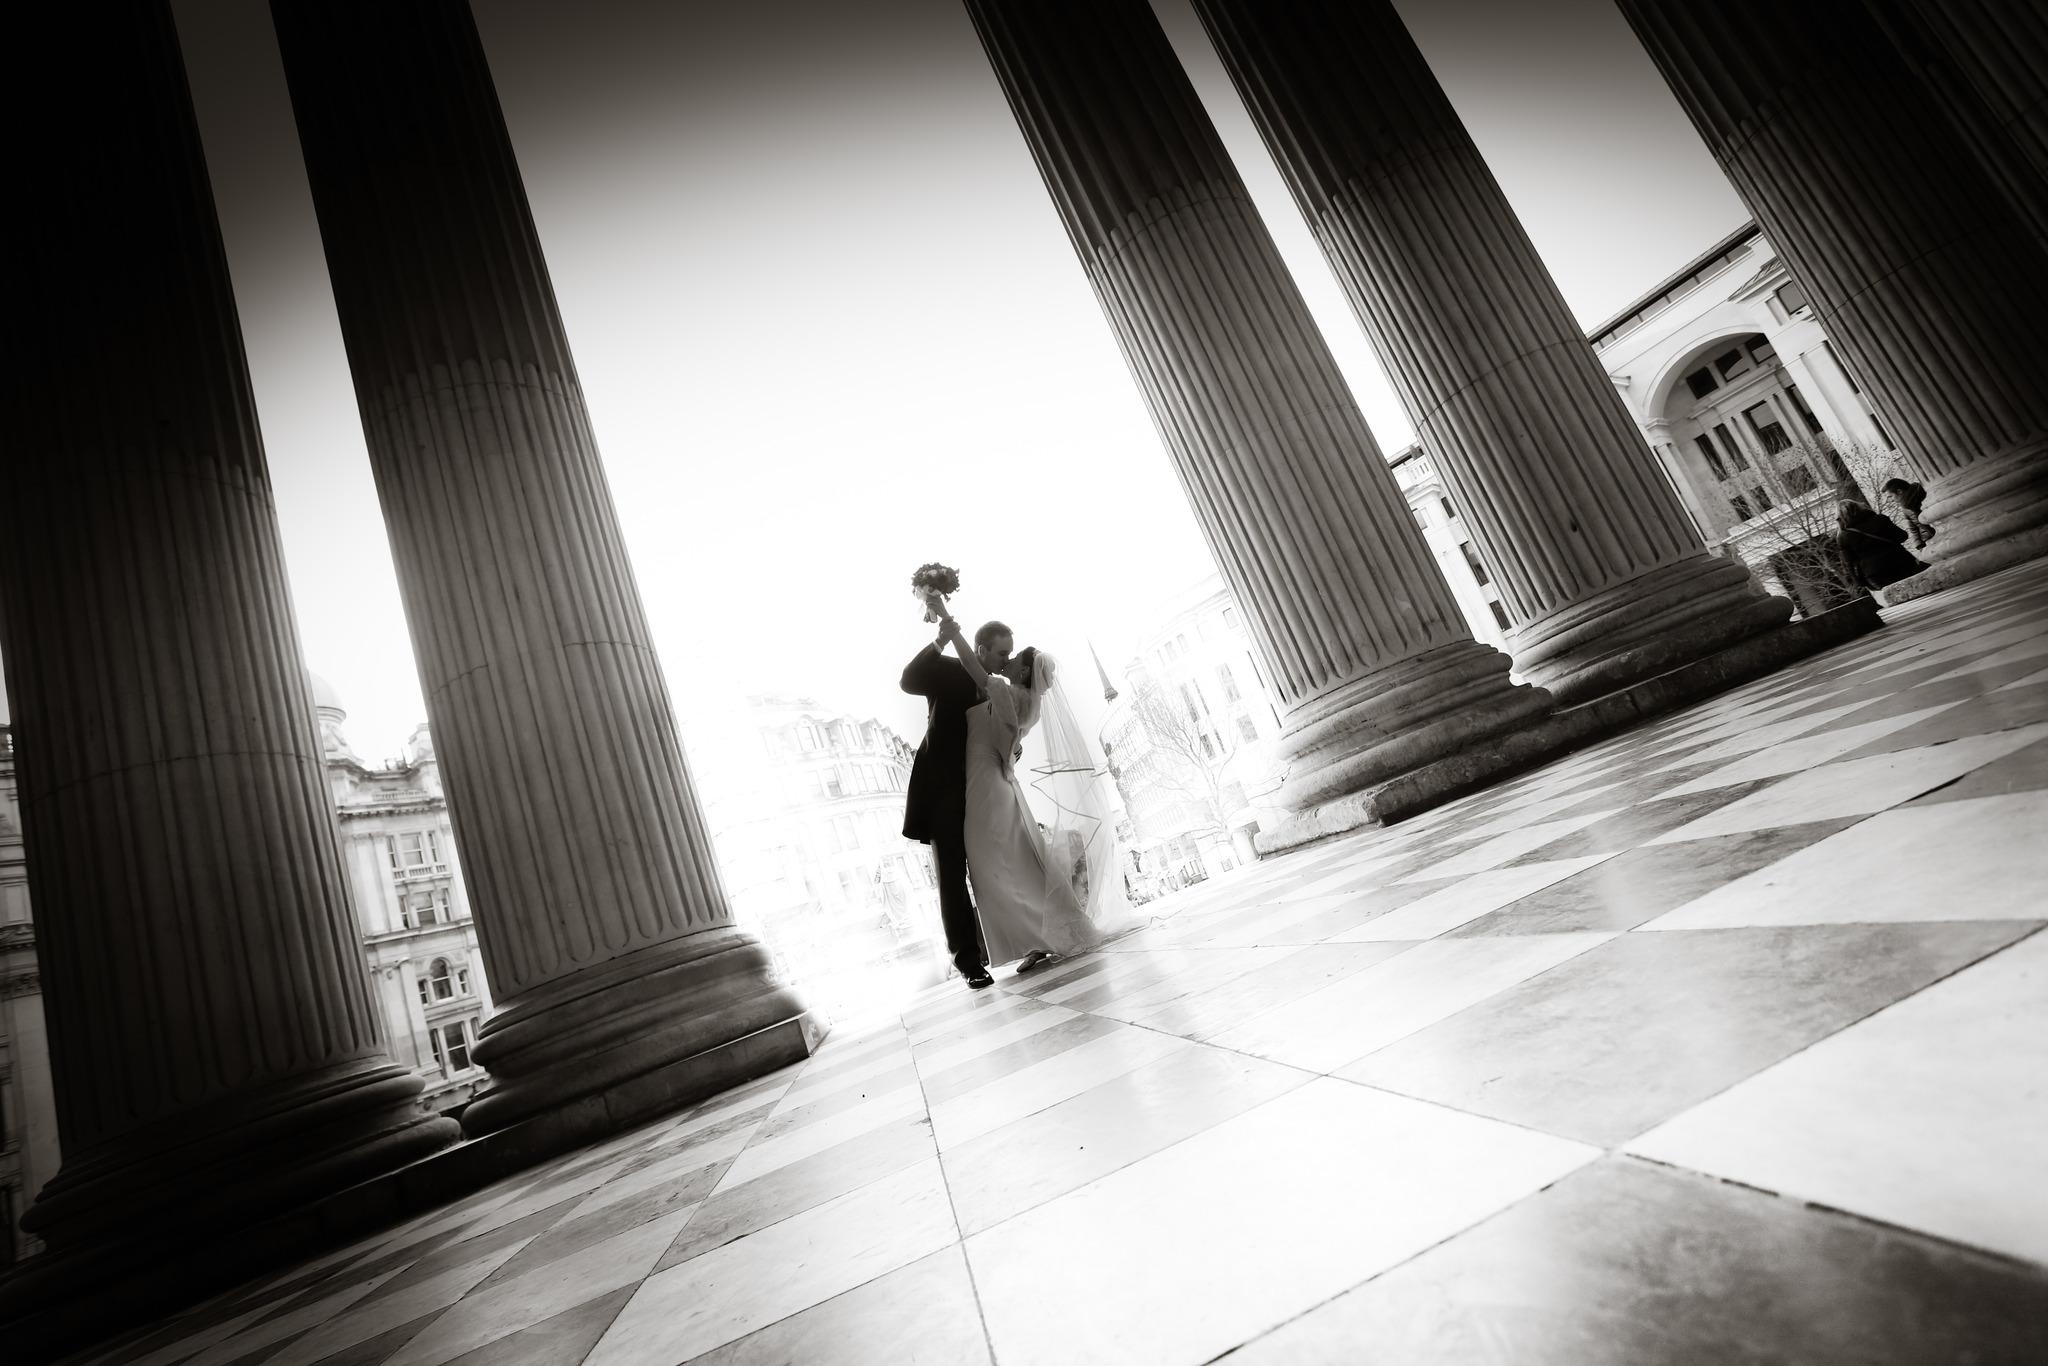 FBW_Winter_Weddings_001.jpg